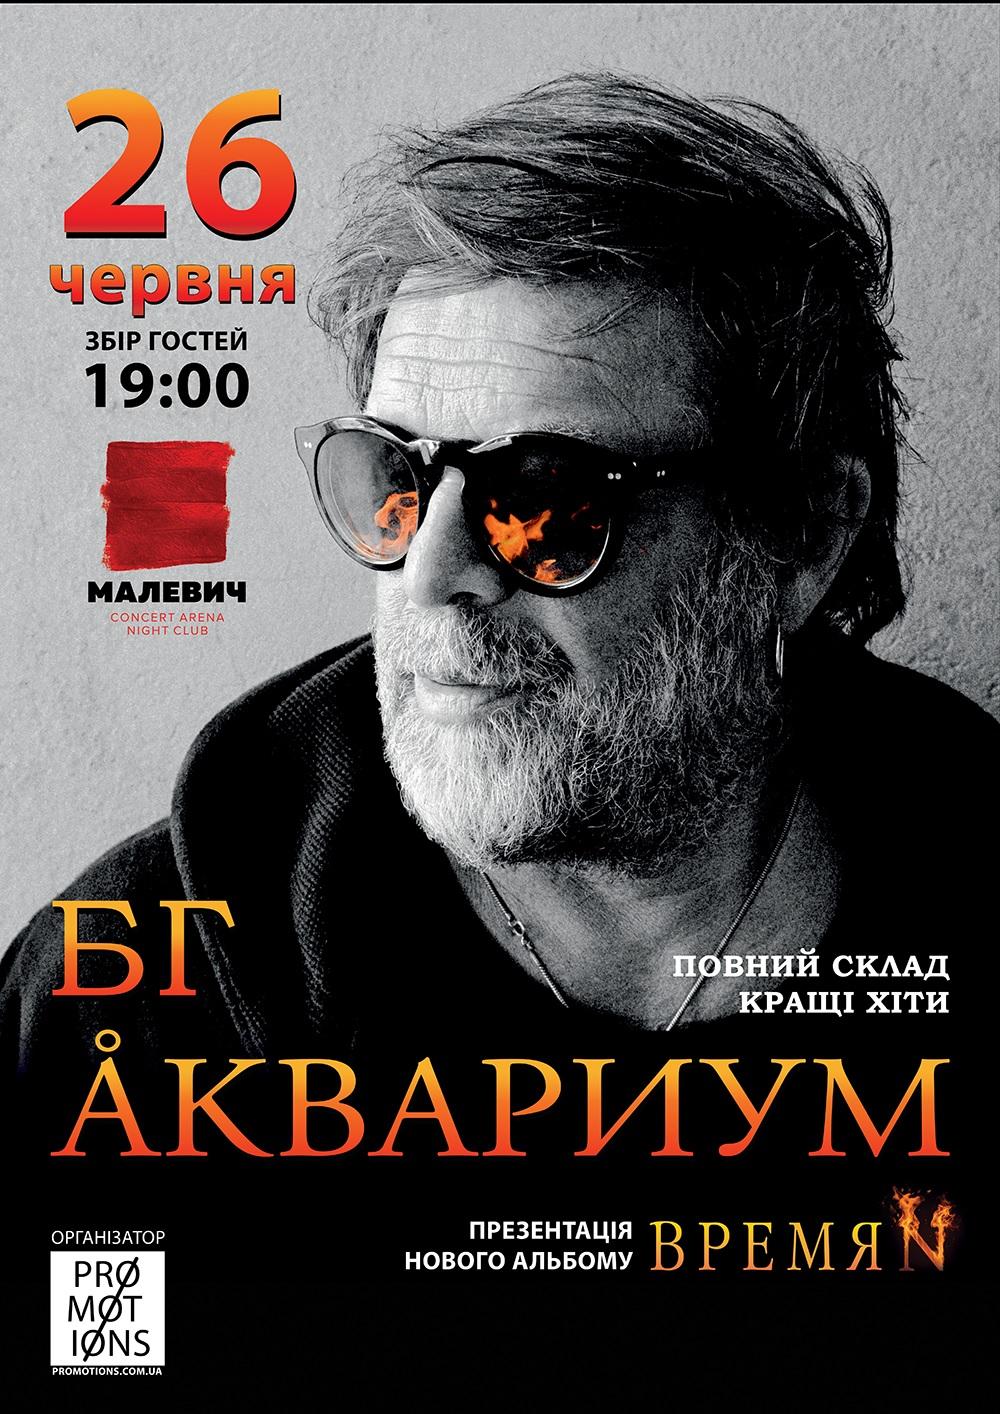 koncert-gurtu-akvarium-ta-borisa-grebenszikova.jpg (9.08 Kb)